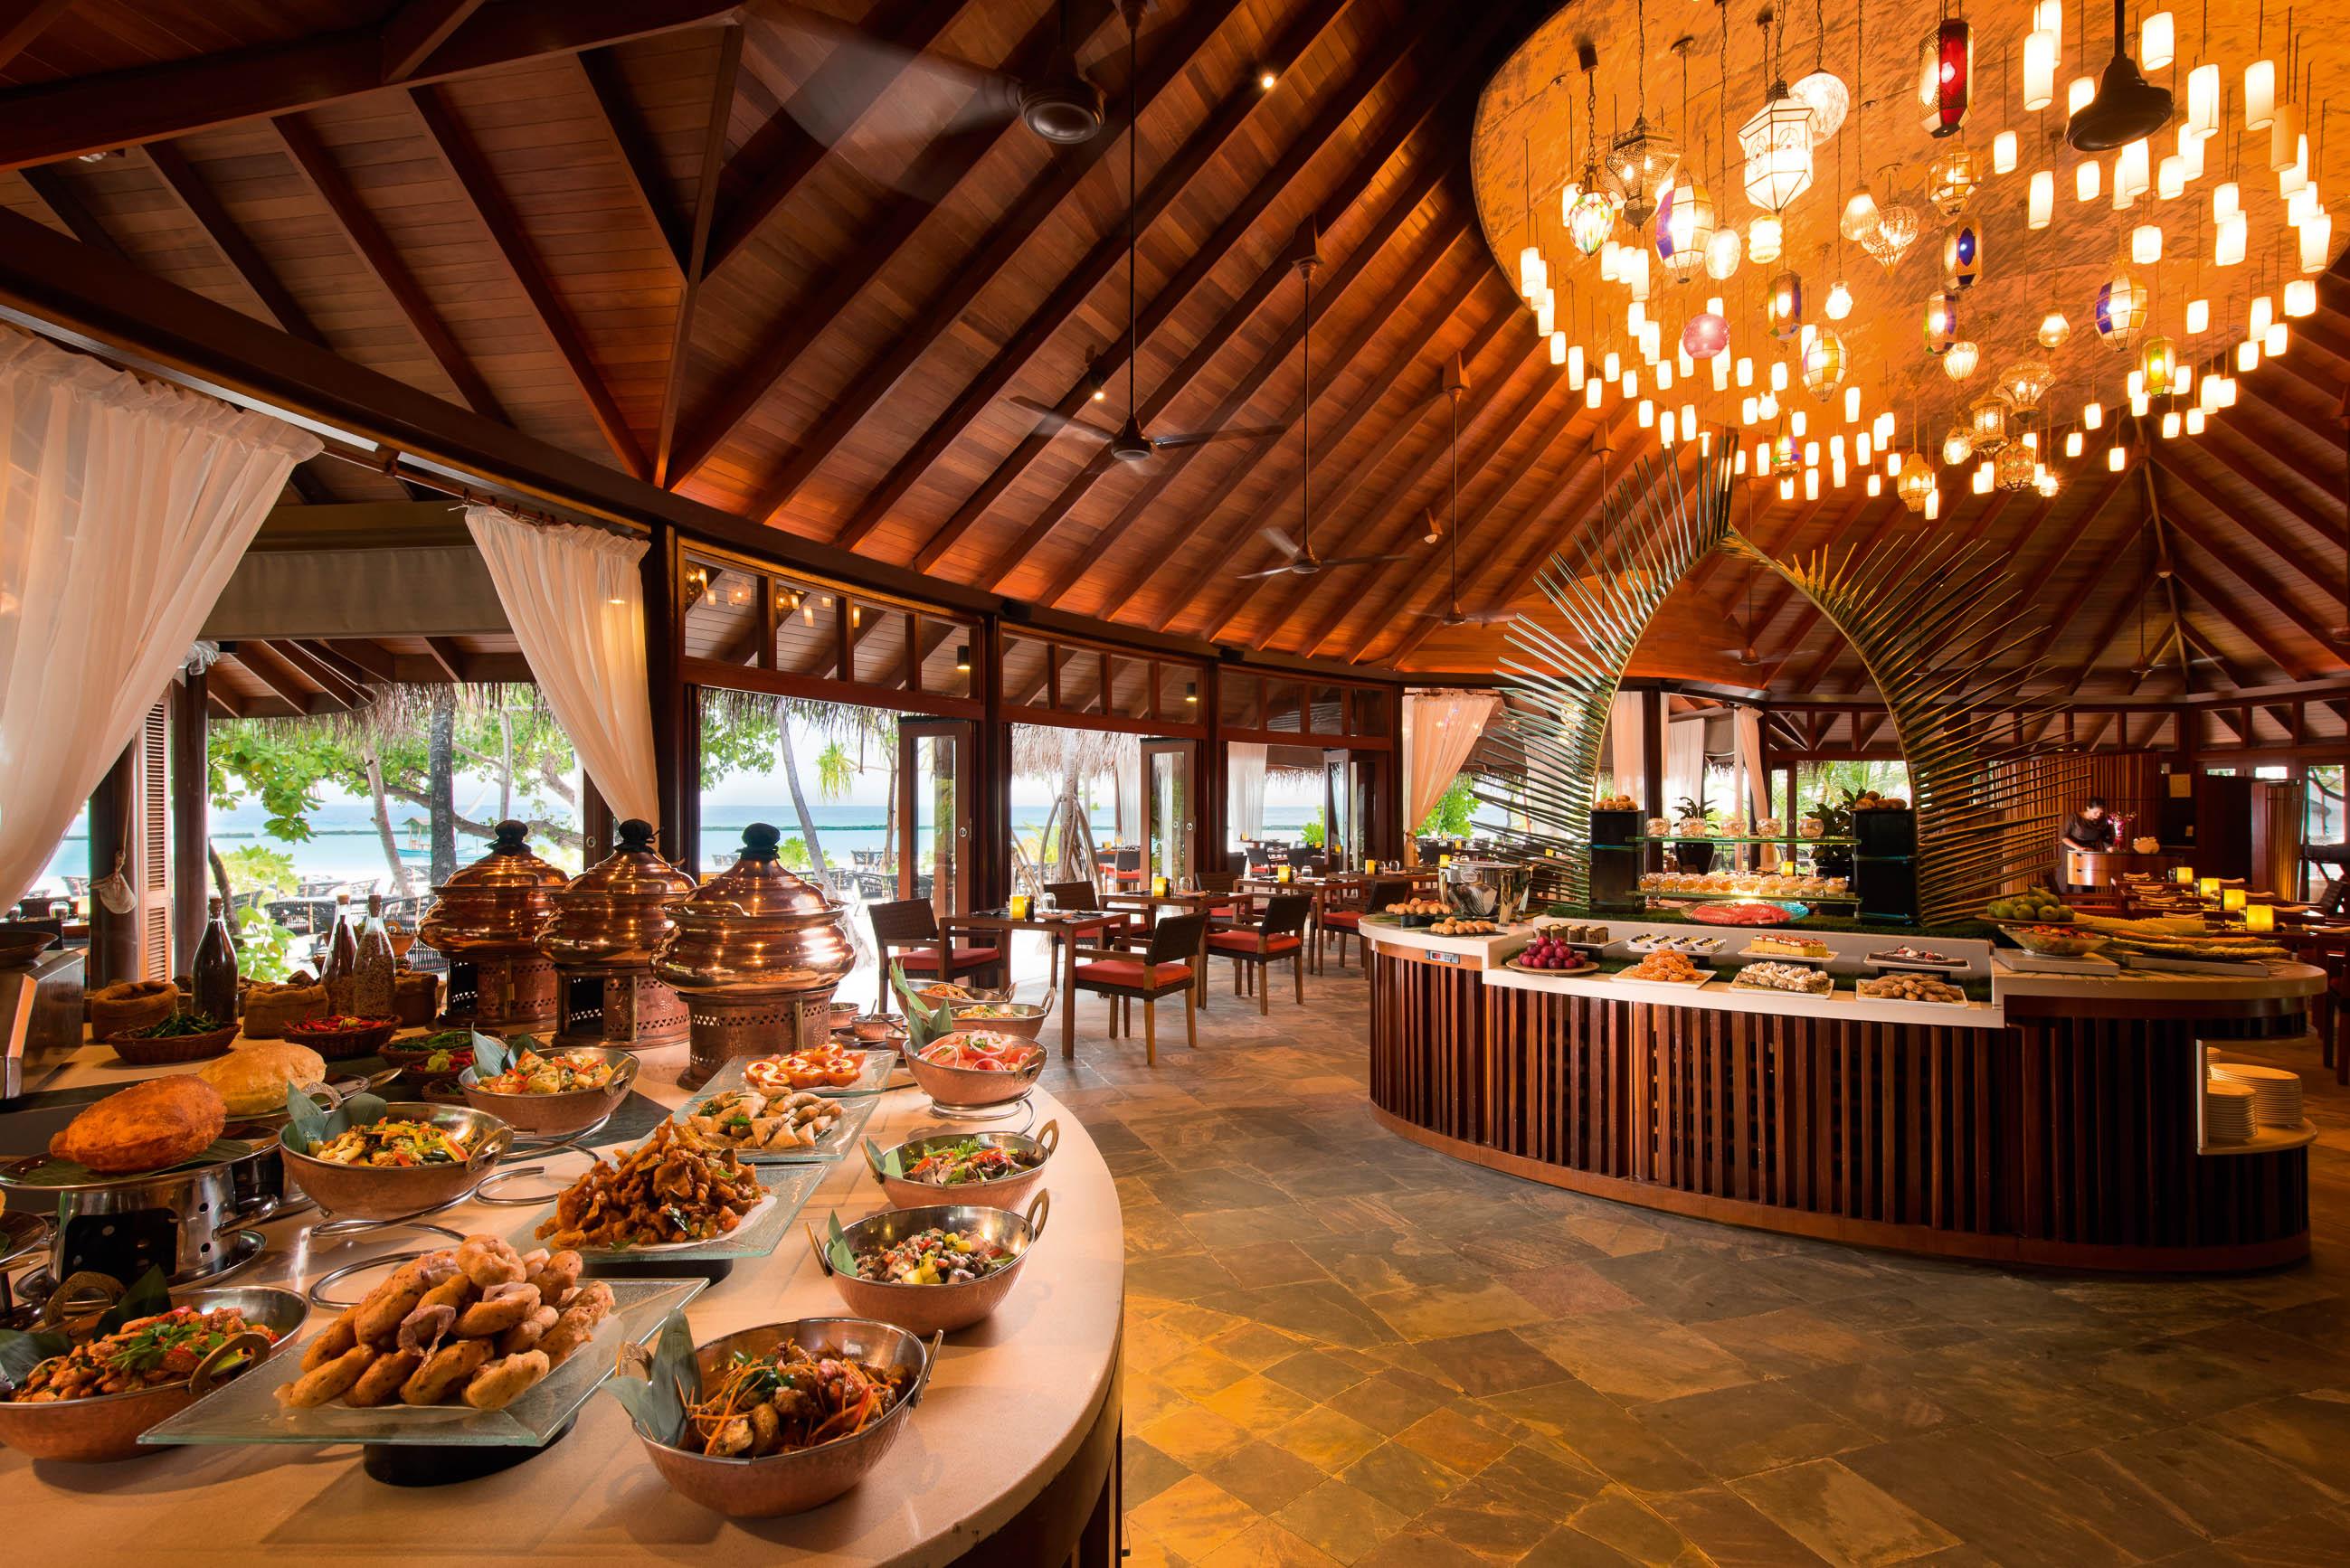 https://bubo.sk/uploads/galleries/16372/halaveli-maldives-2016-jahaz-buffet-02_hd-13.jpg